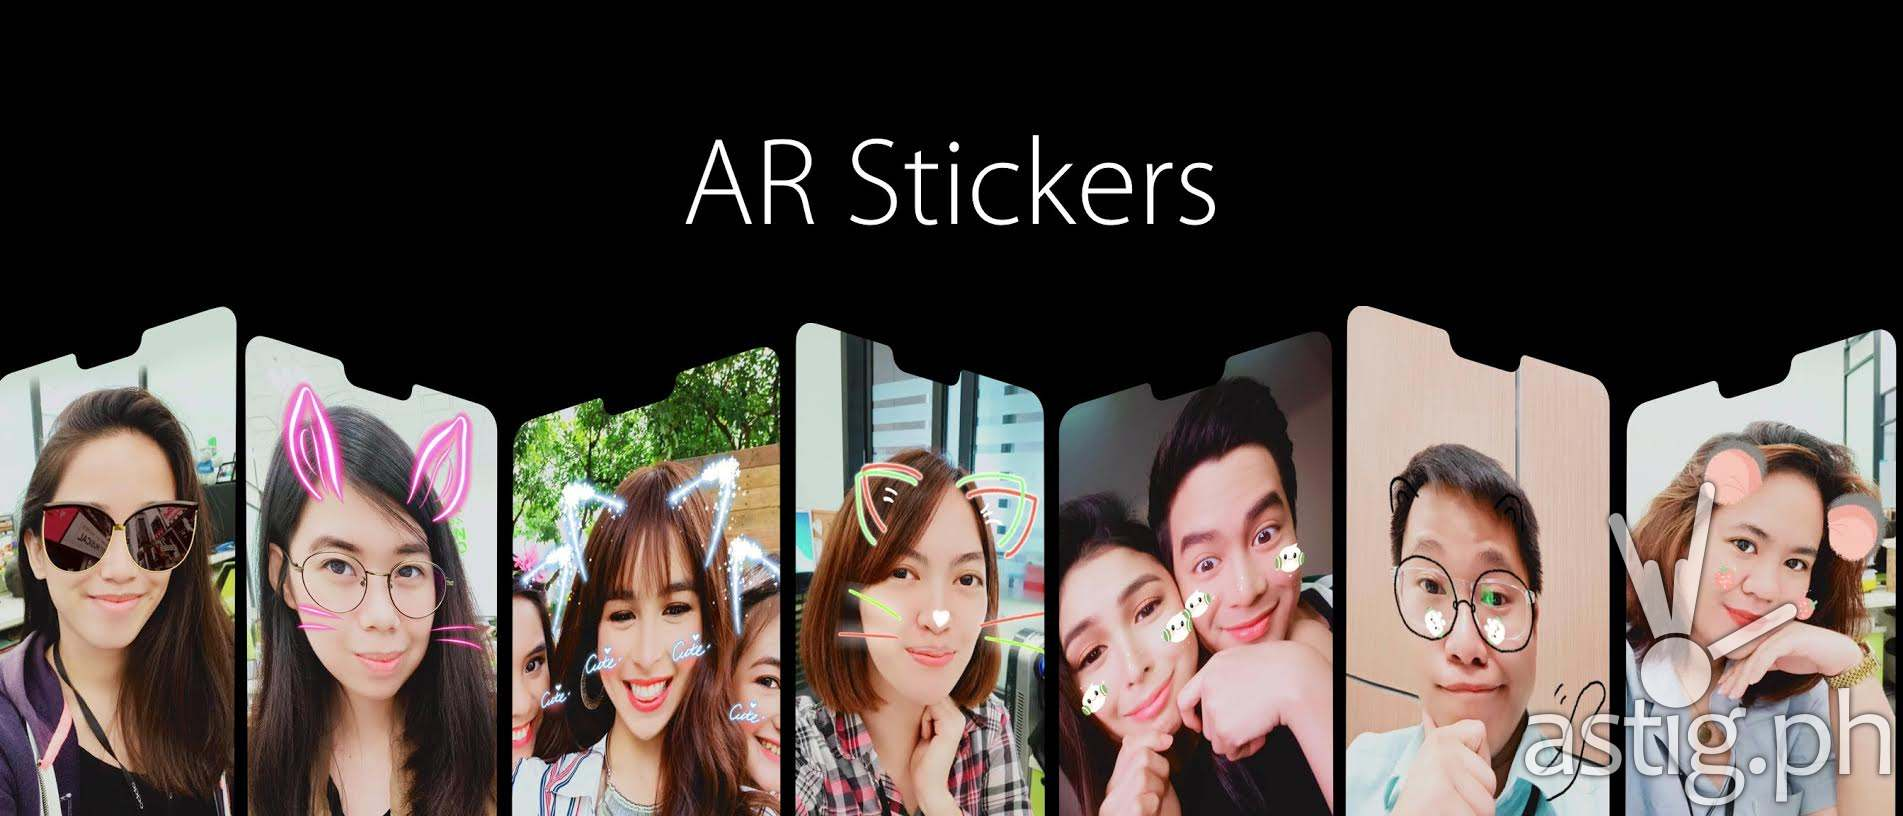 OPPO F7 AR Stickers